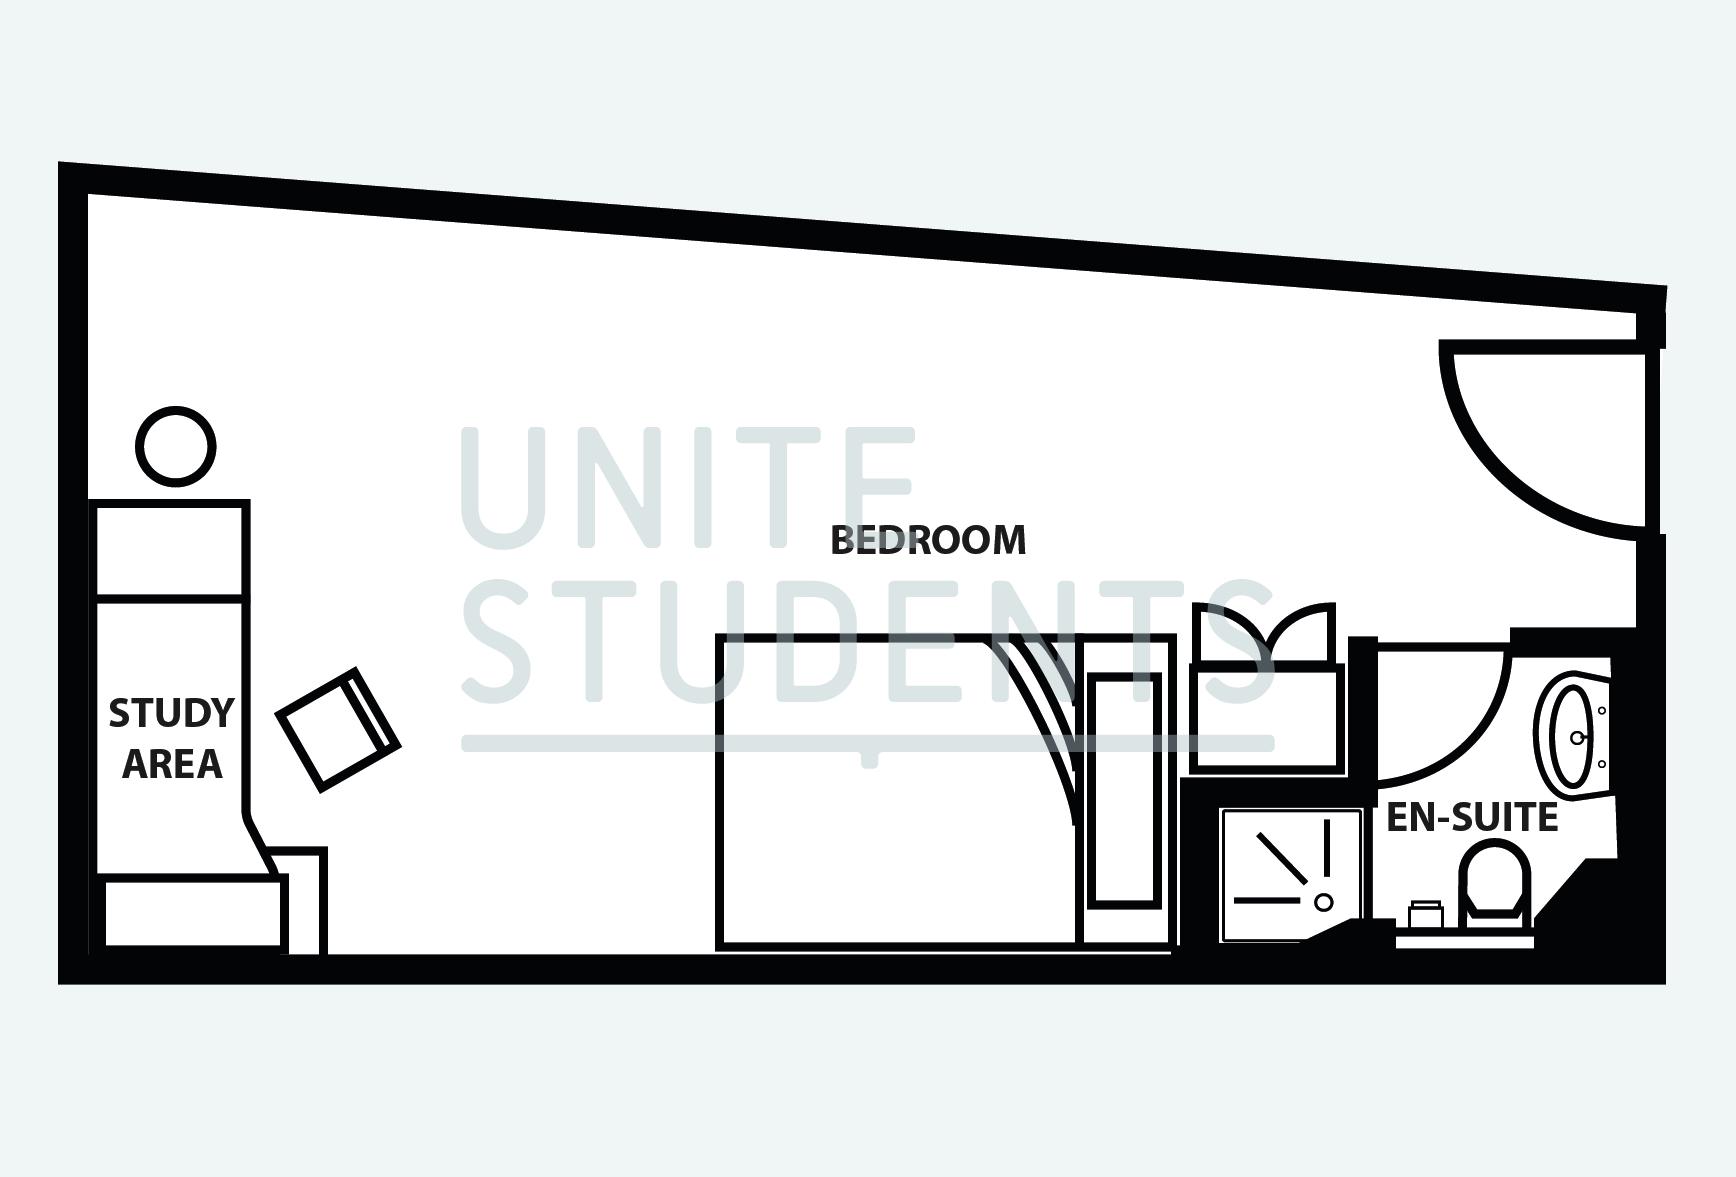 Crown-house-reading-Floorplan-Unilodgers